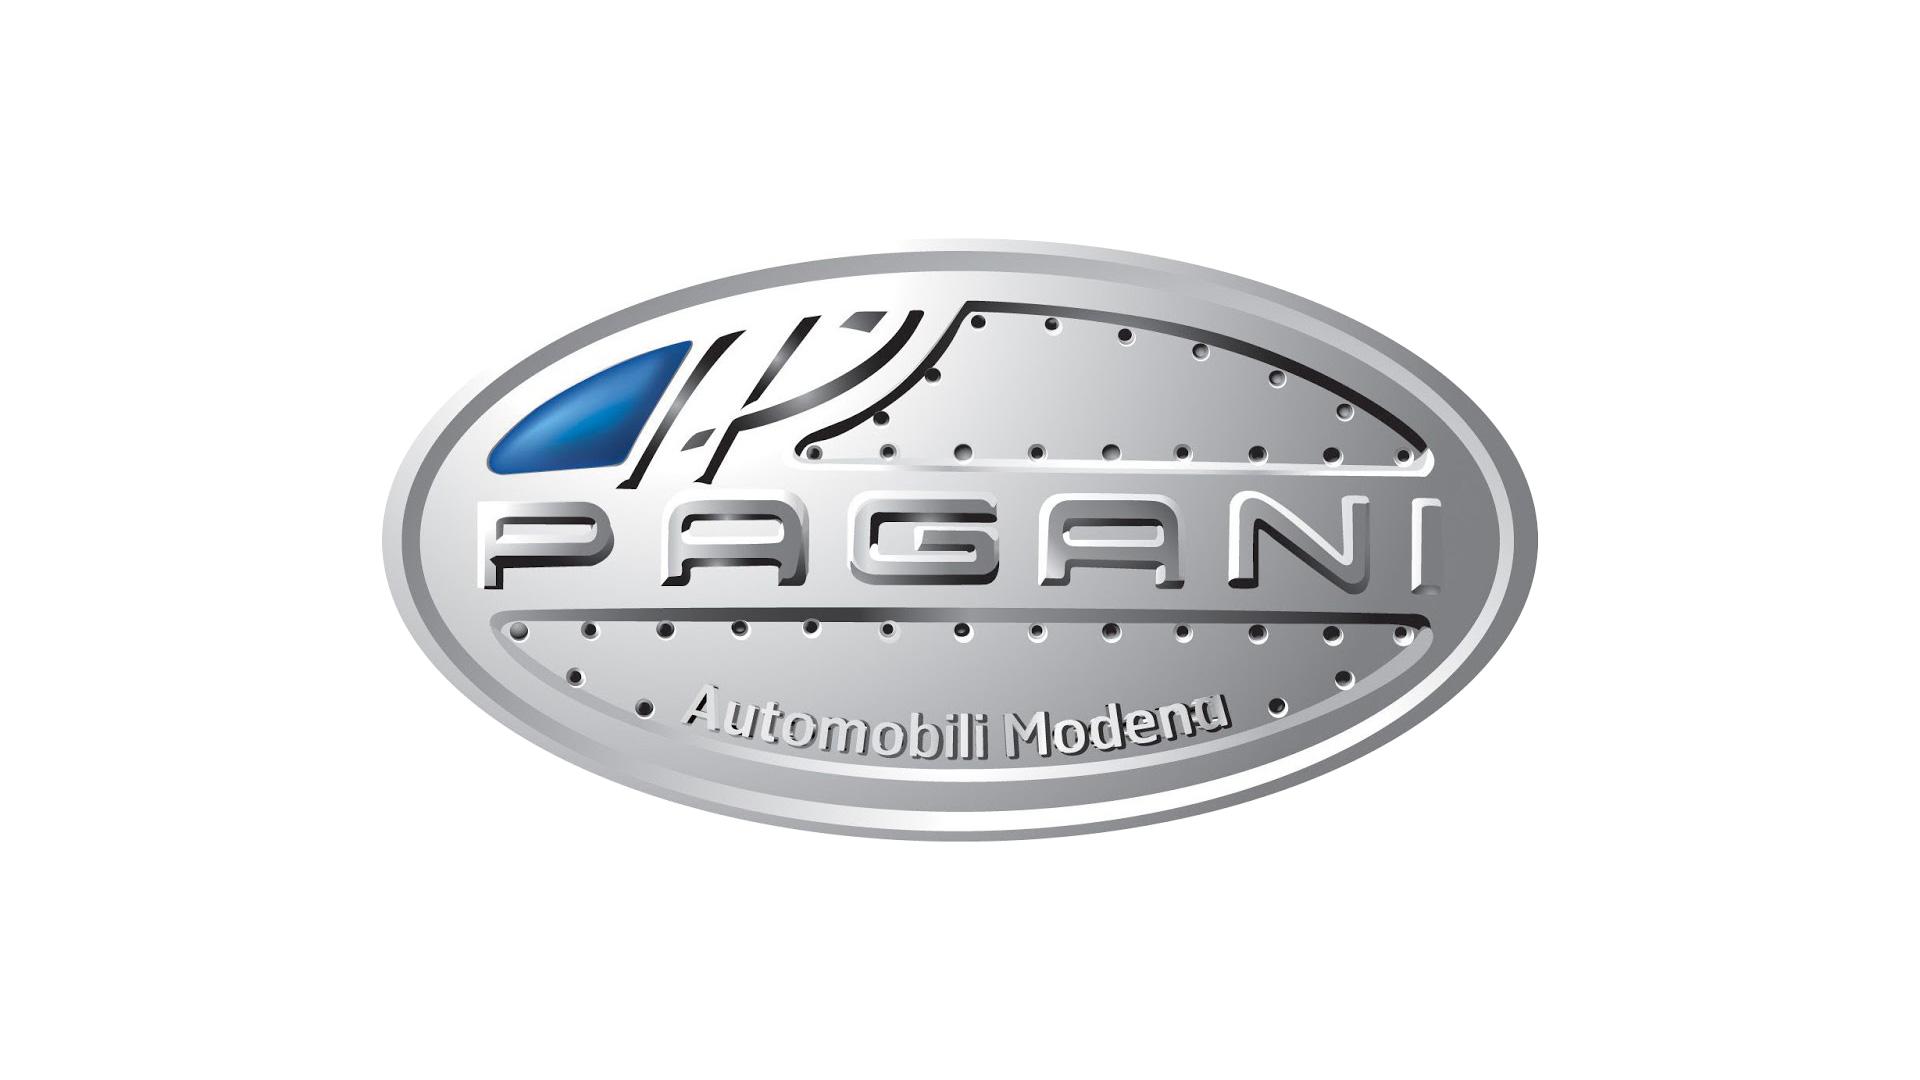 Pagani Logo Hd Png Information Car Logos Car Brands Logos Pagani Car